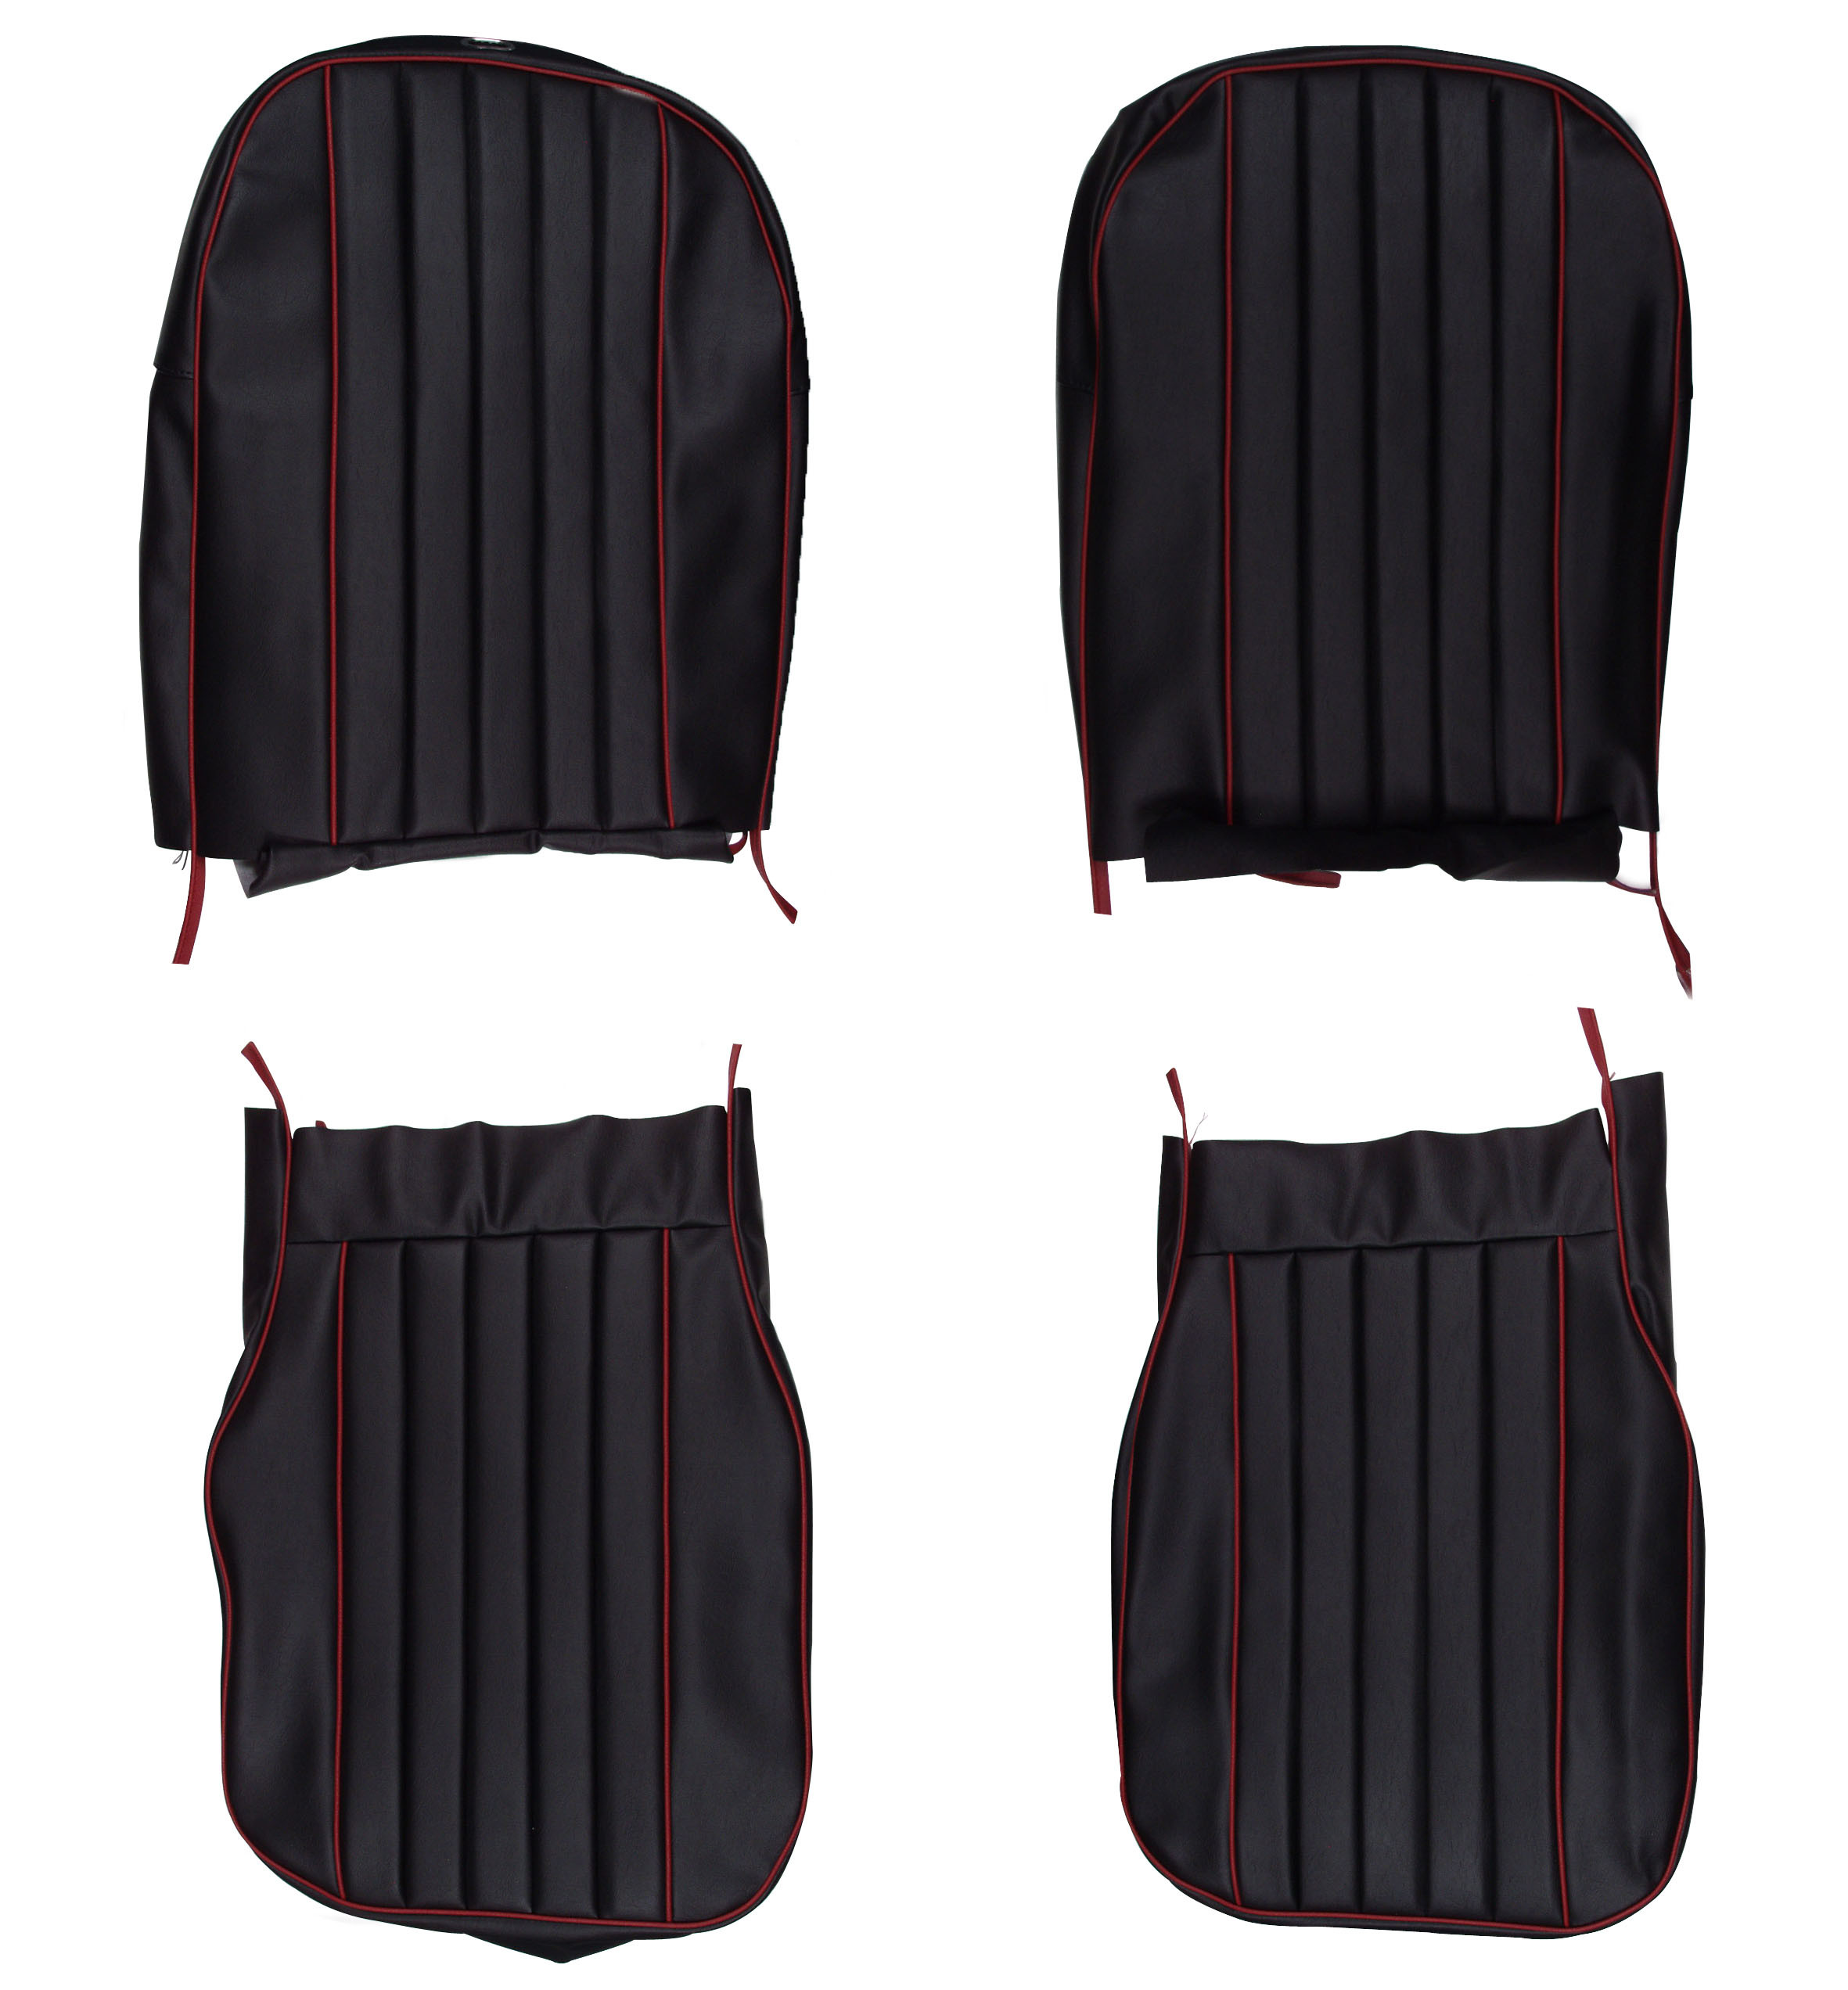 Sprite / Midget Leather seat covers